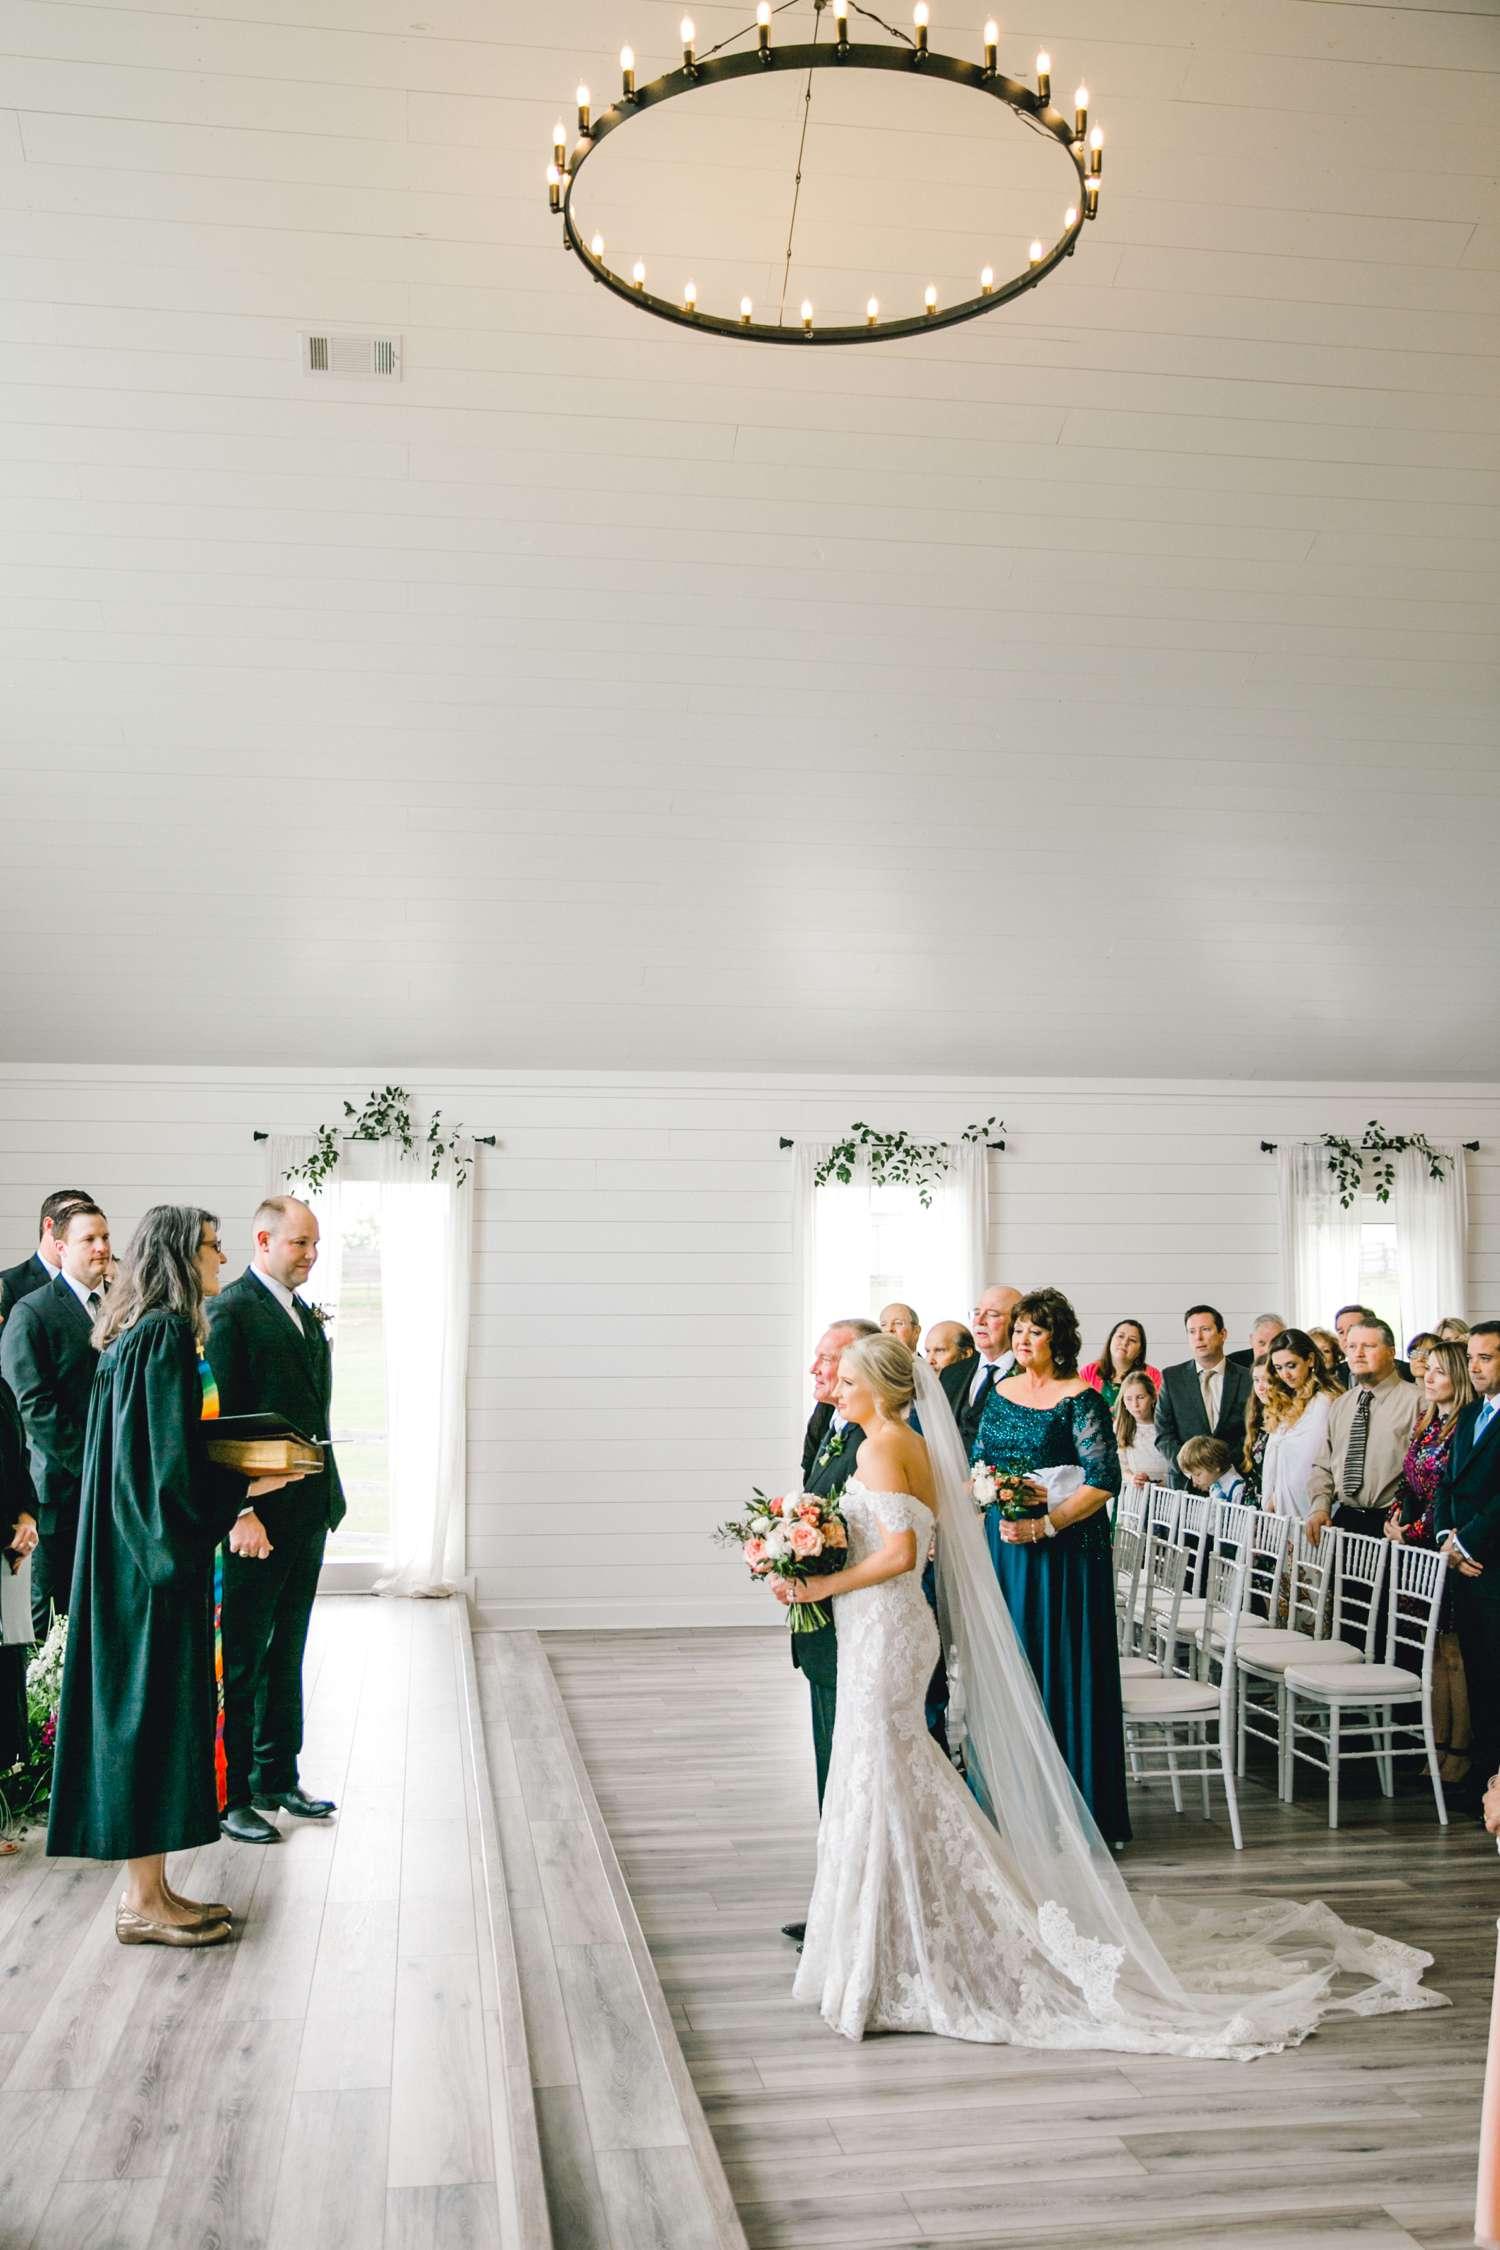 HEBERT_MORGAN_AND_CLAY_ALLEEJ_THE_FARMHOUSE_MONTGOMERY_TEXAS_WEDDING_0083.jpg